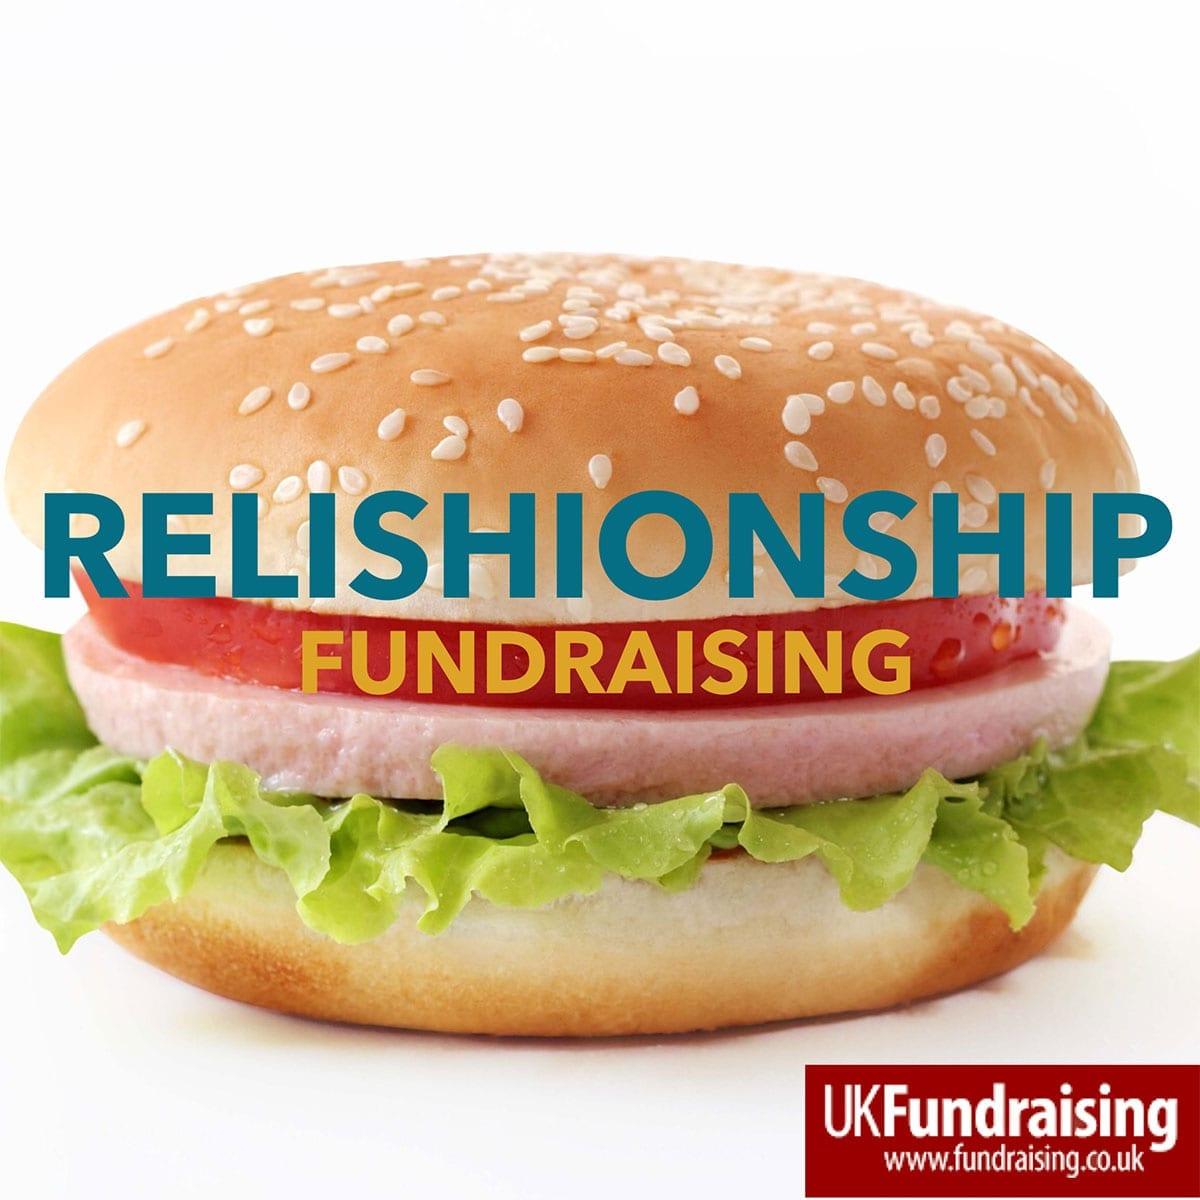 Relishionship fundraising